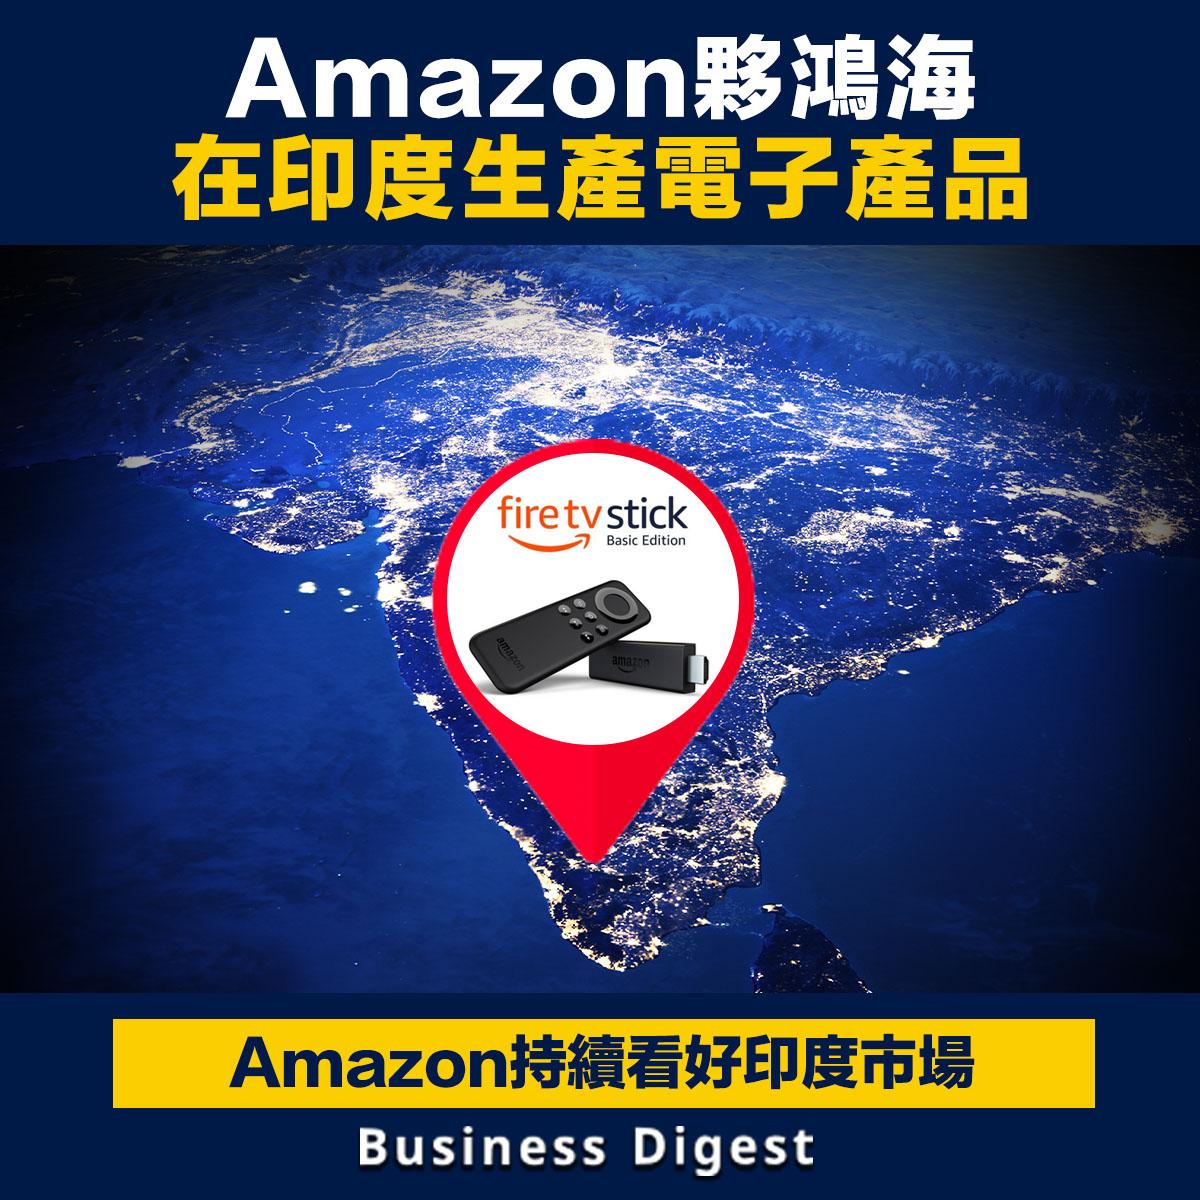 Amazon夥鴻海在印度生產電子產品